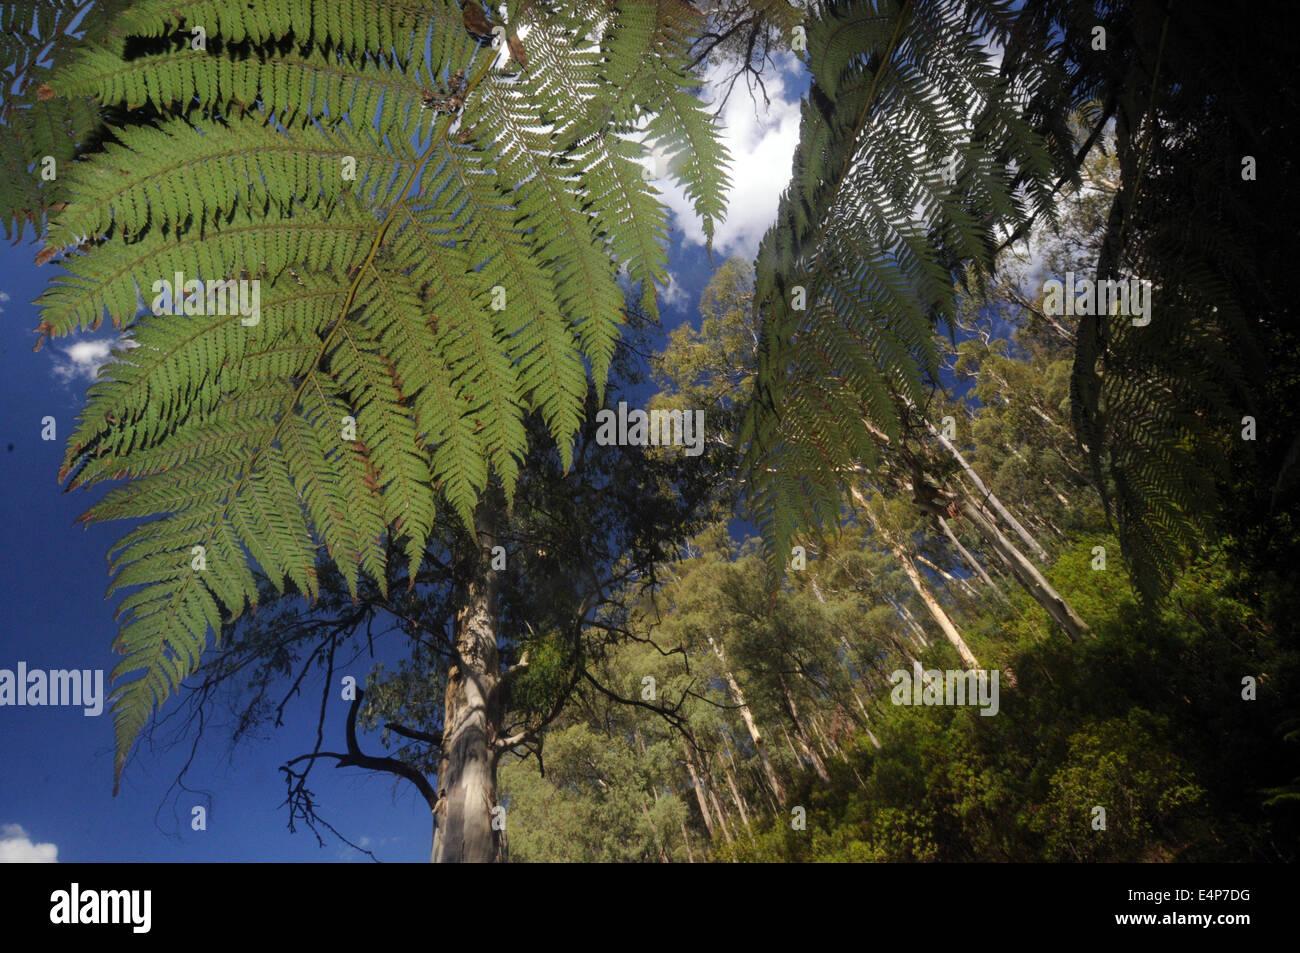 Looking up through treefern fronds at mountain ash forest, Snowy Mountains, Kosciuszko National Park, NSW, Australia - Stock Image